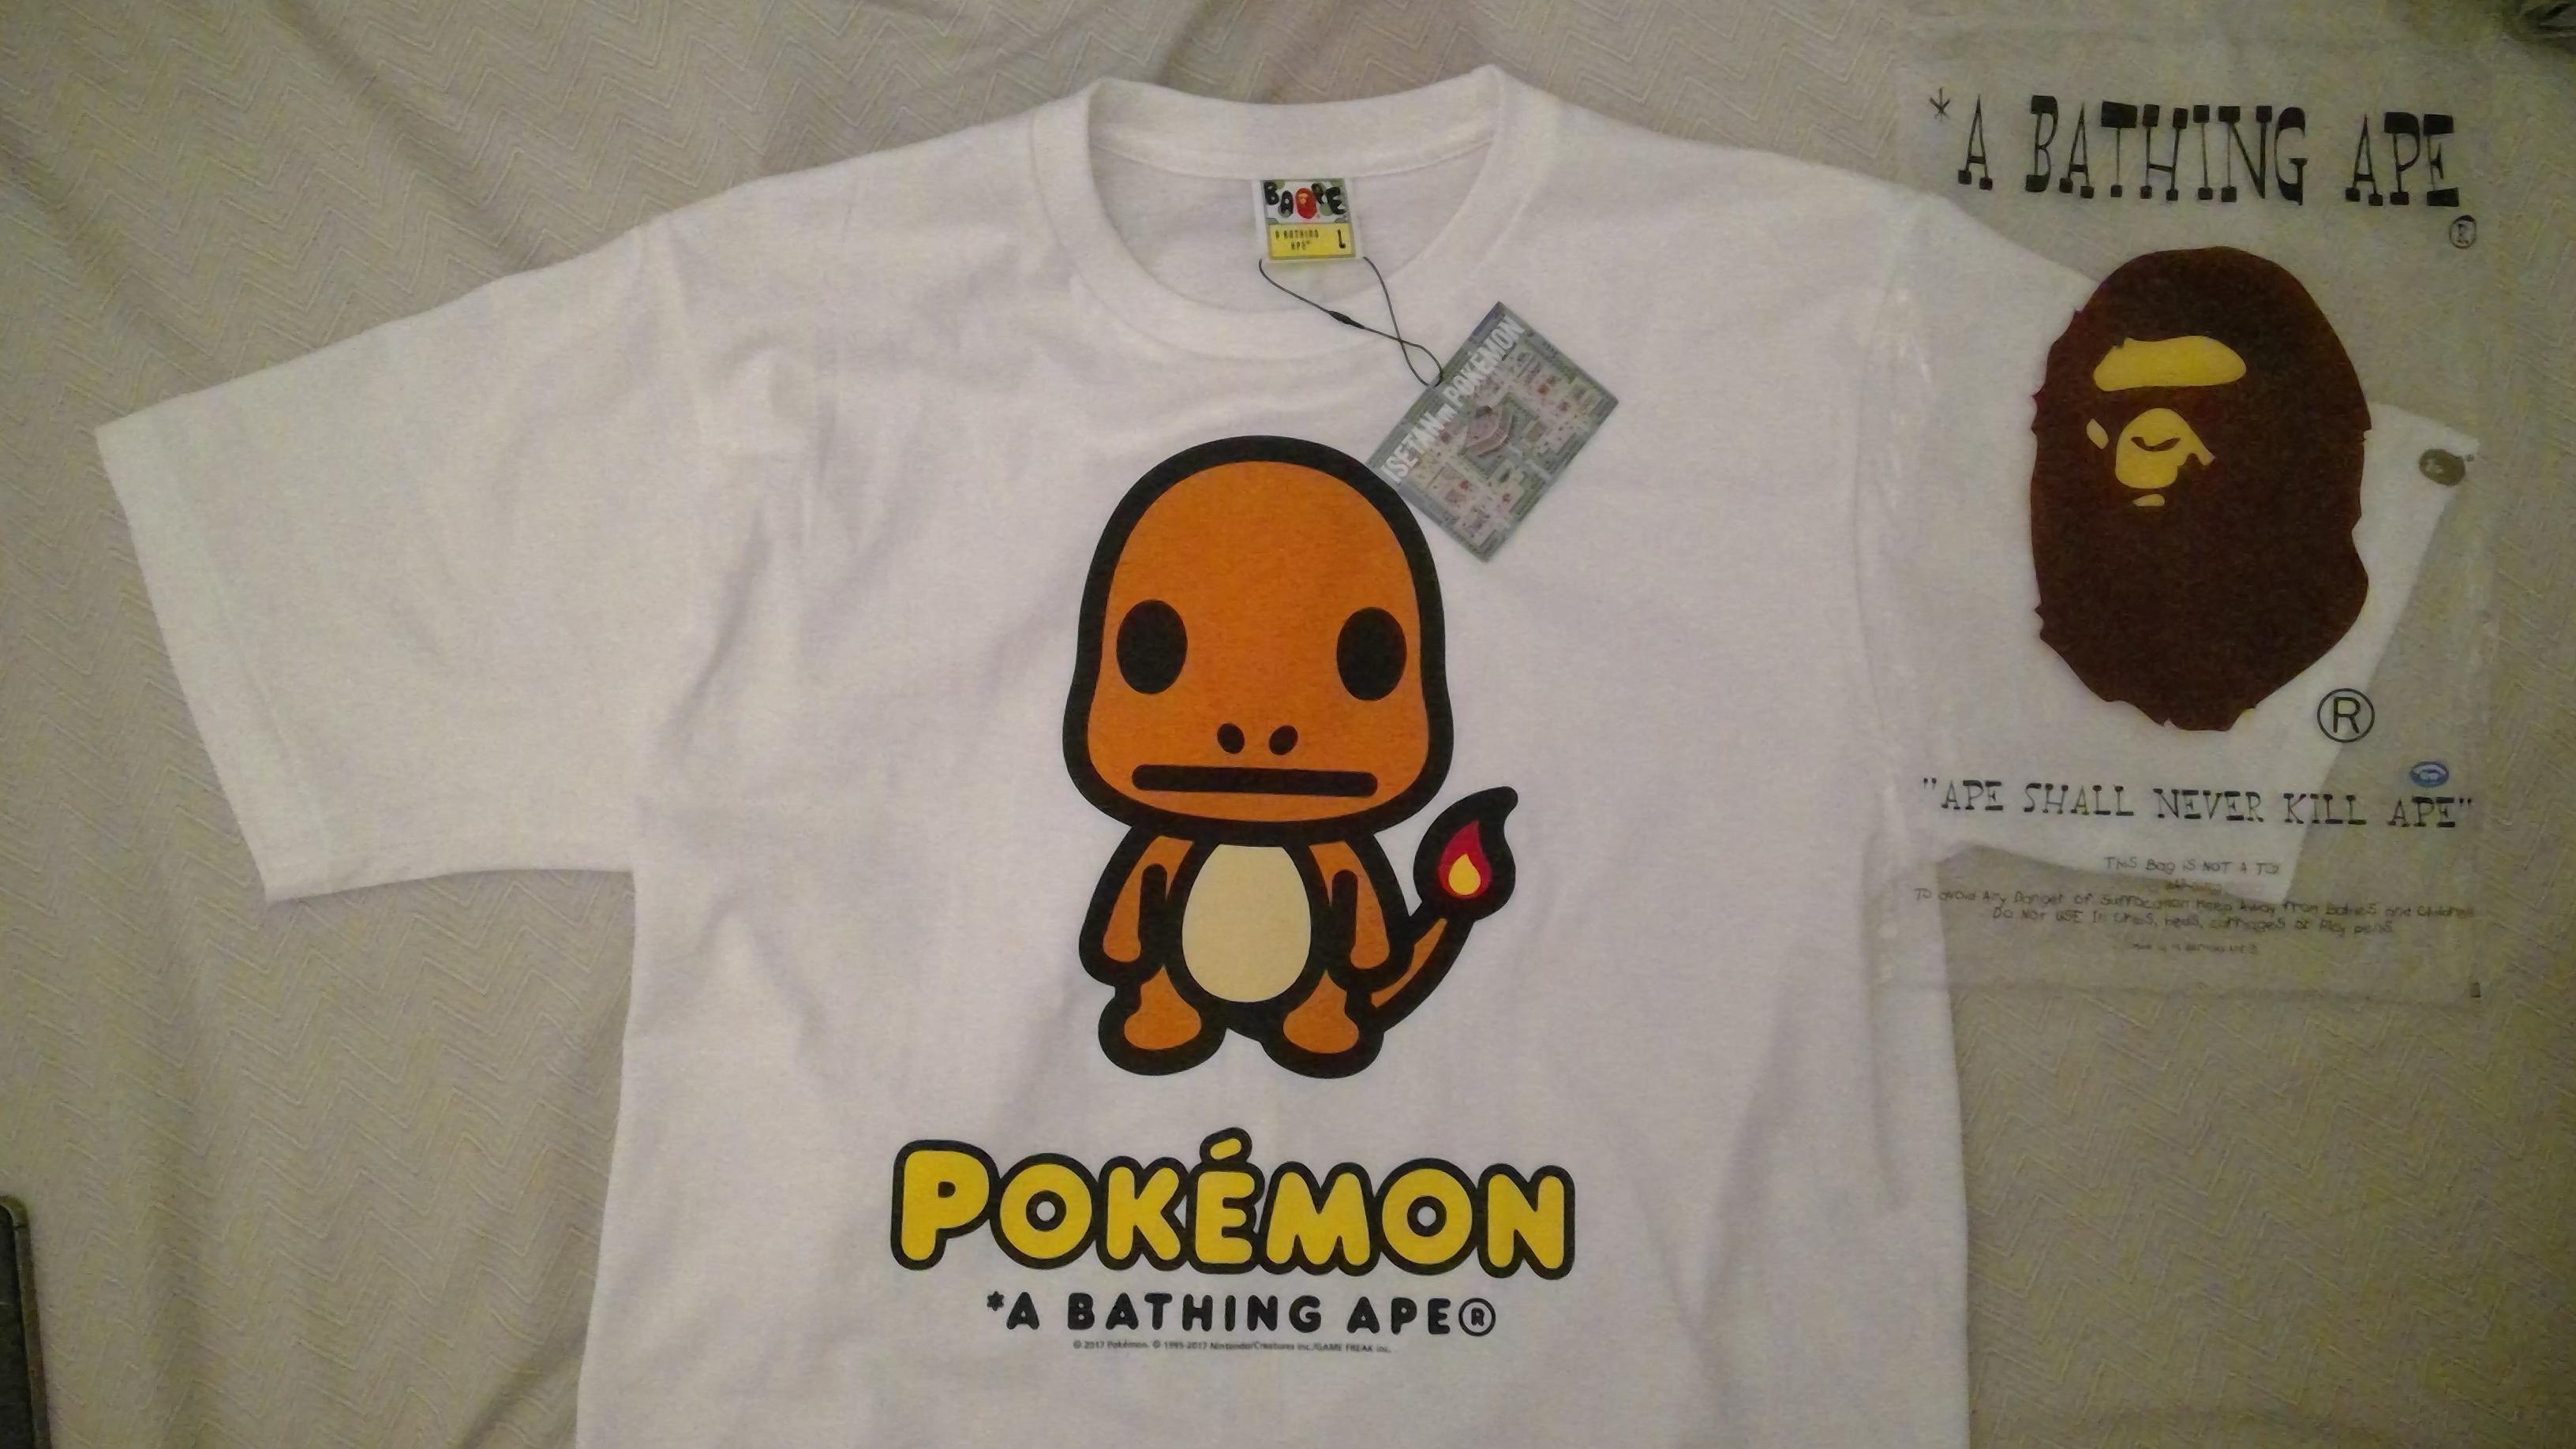 * A BATHING APE Pokemon COLLECTION Men/'s BAPE x POKEMON TEE #2 2color Mankey New